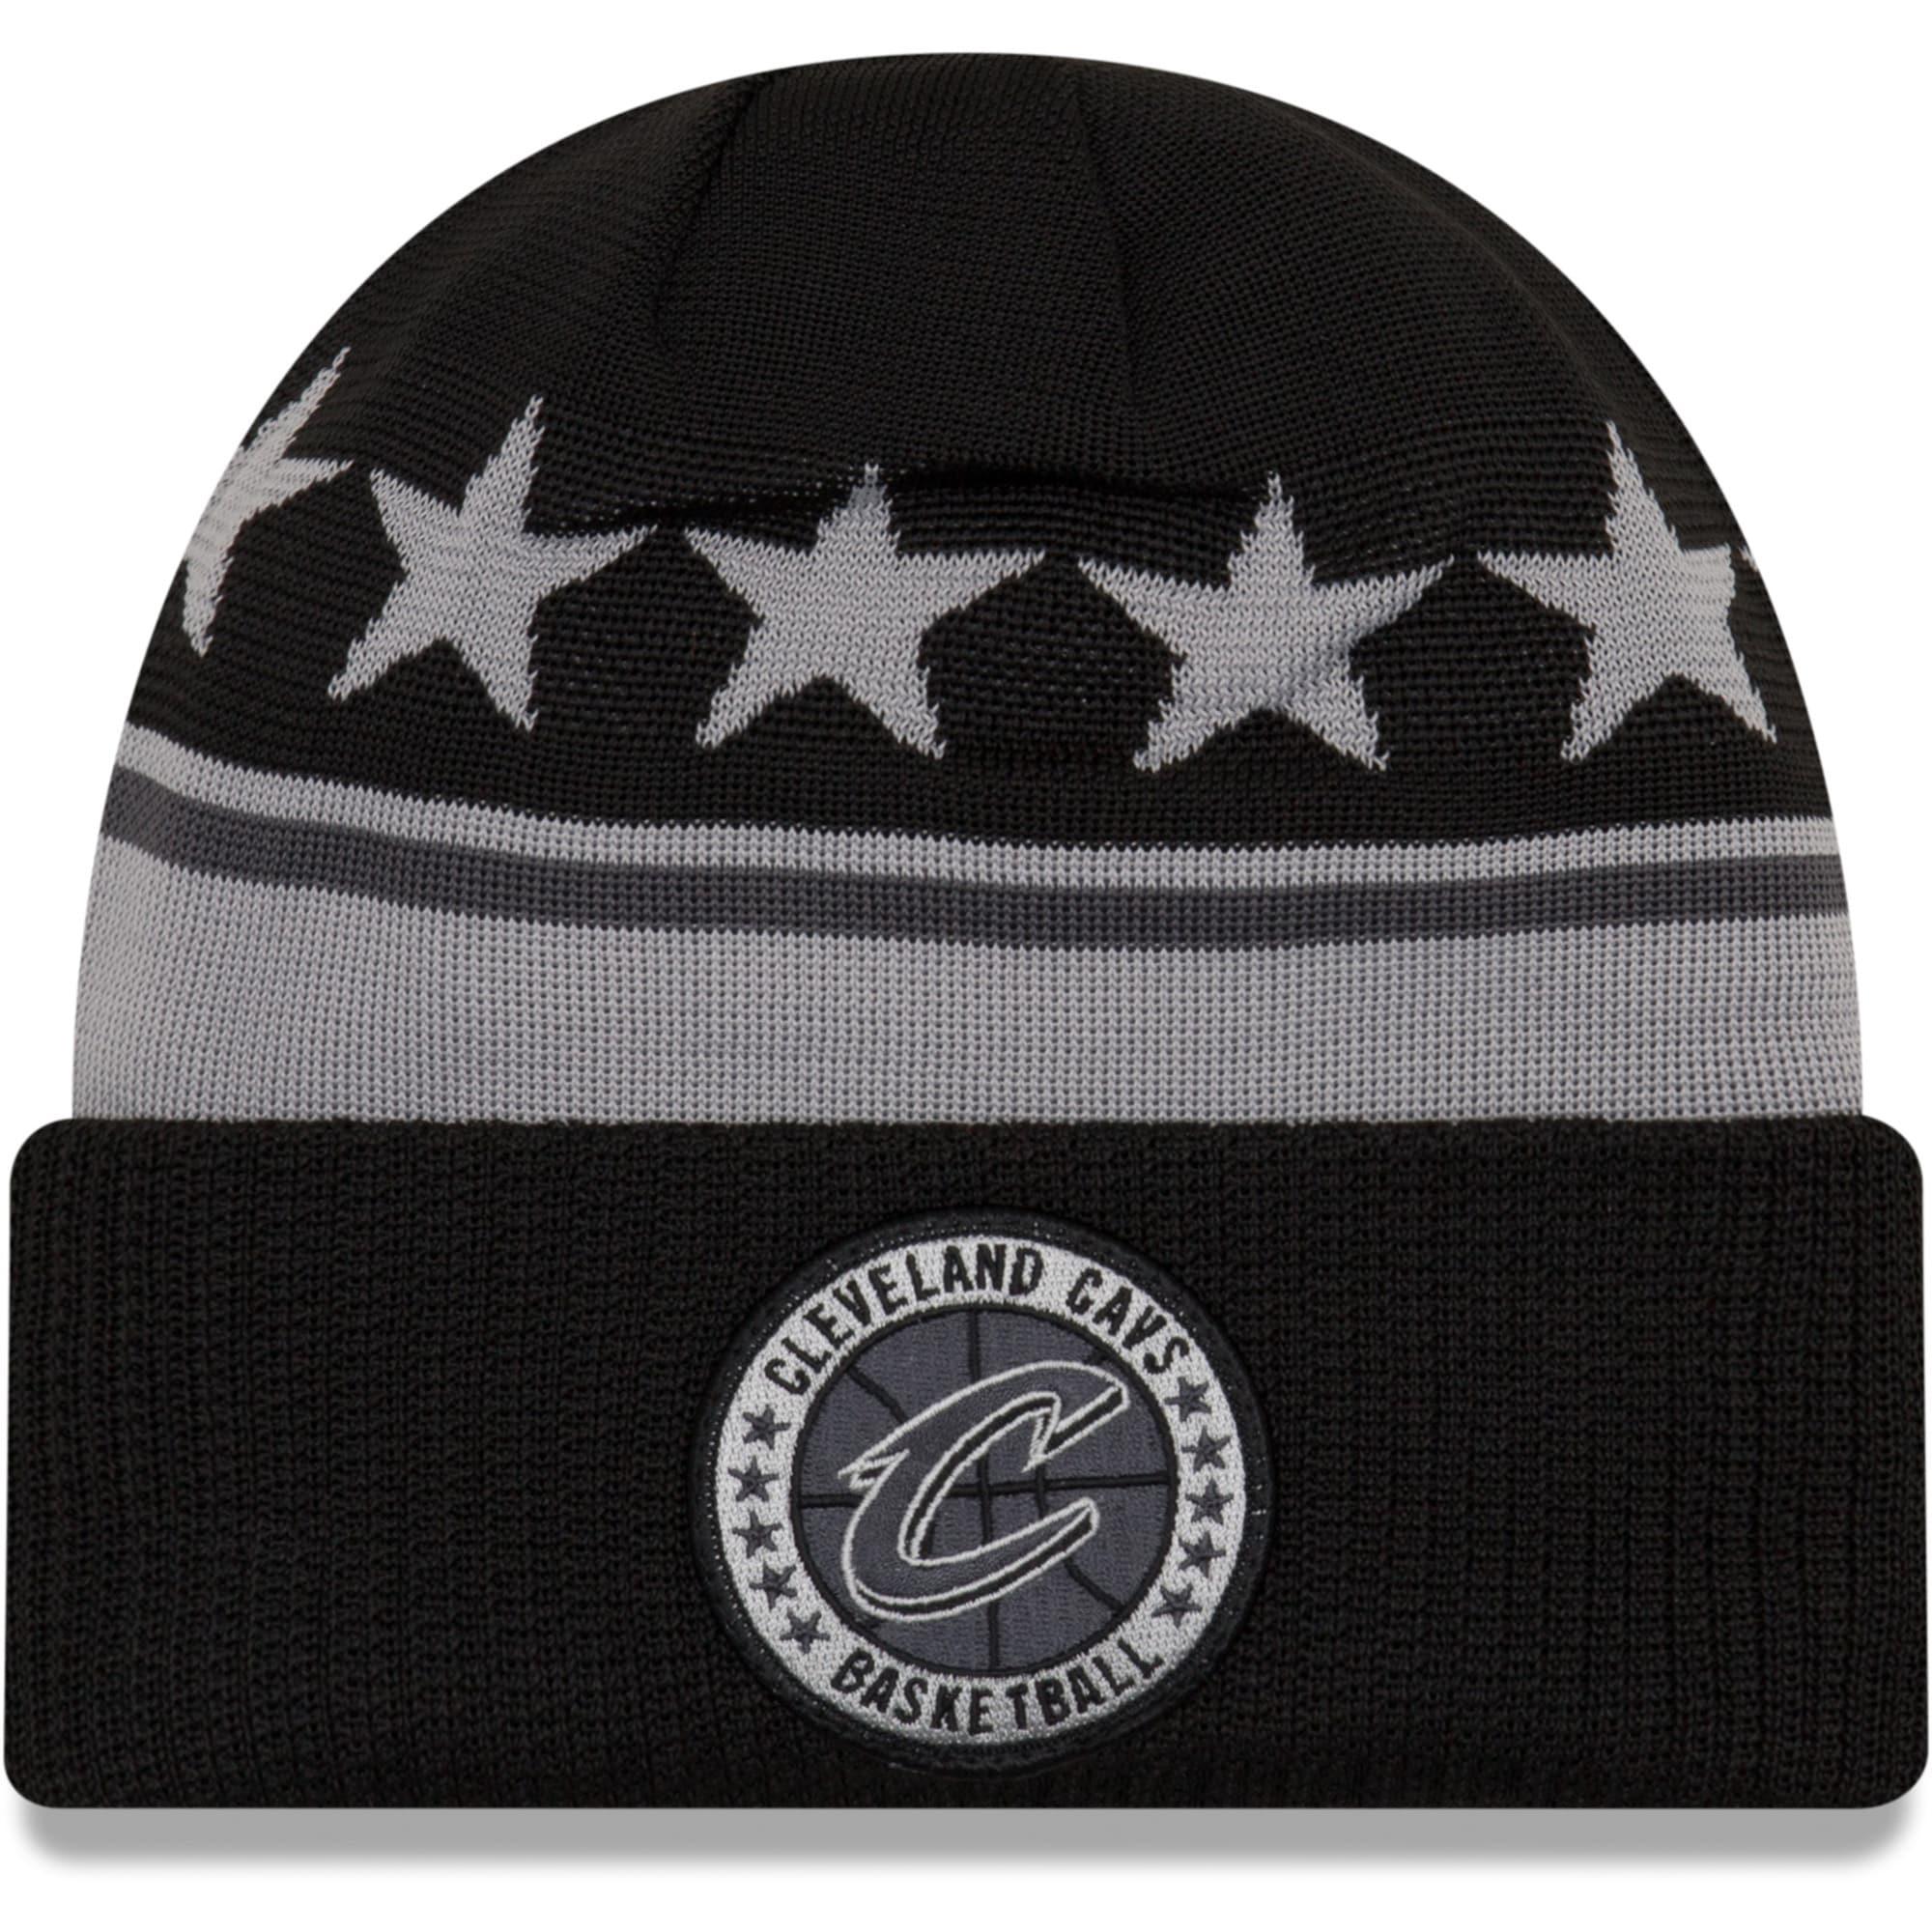 Cleveland Cavaliers New Era 2018 Tip Off Series Cuffed Knit Hat - Black